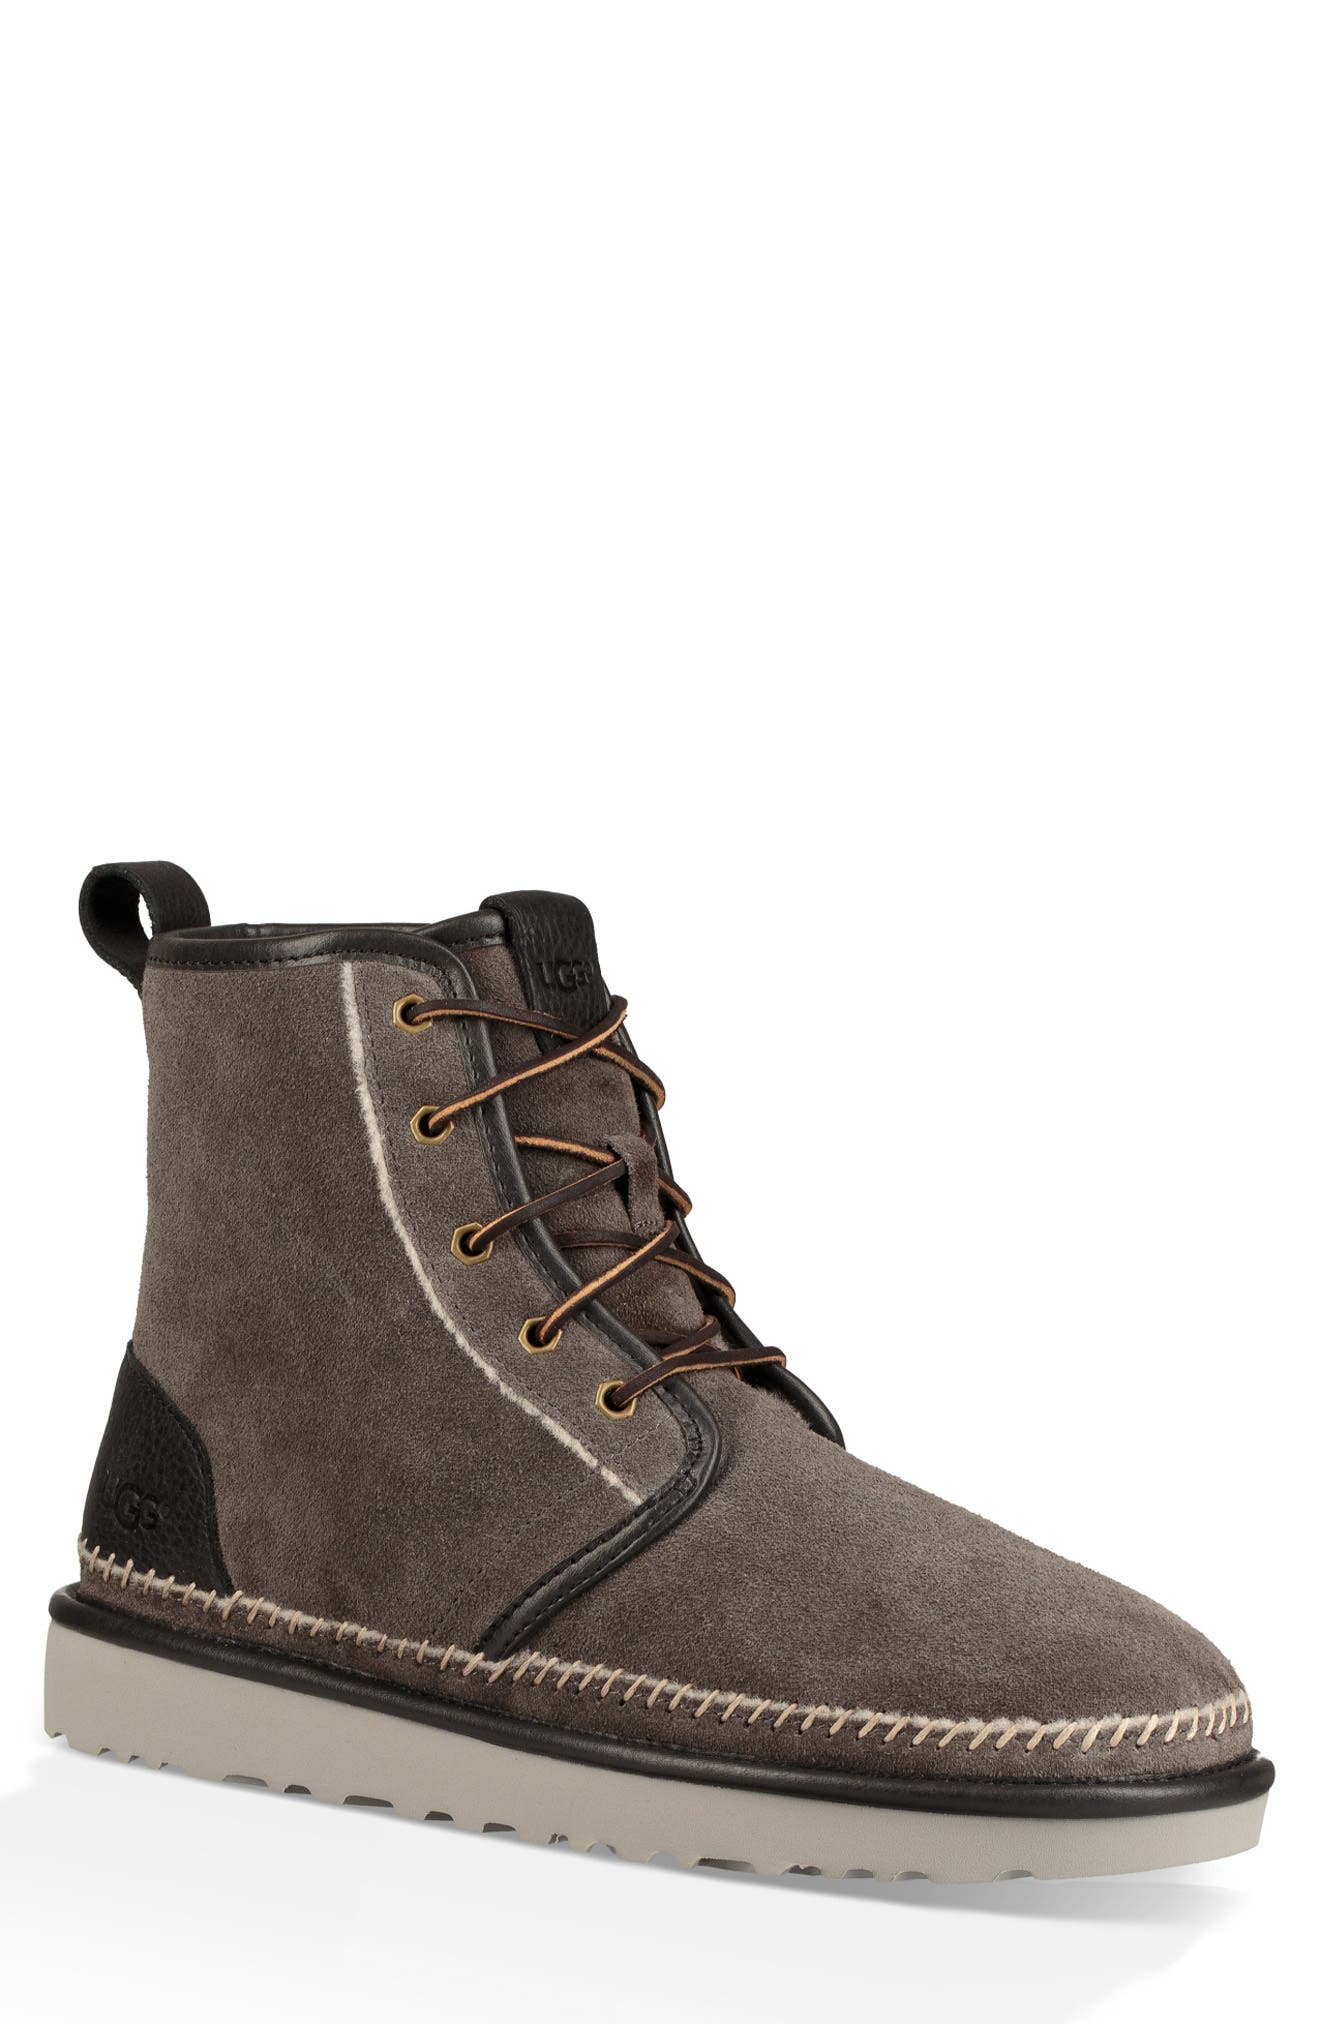 Ugg Harkley Stitch Plain Toe Boot, Grey